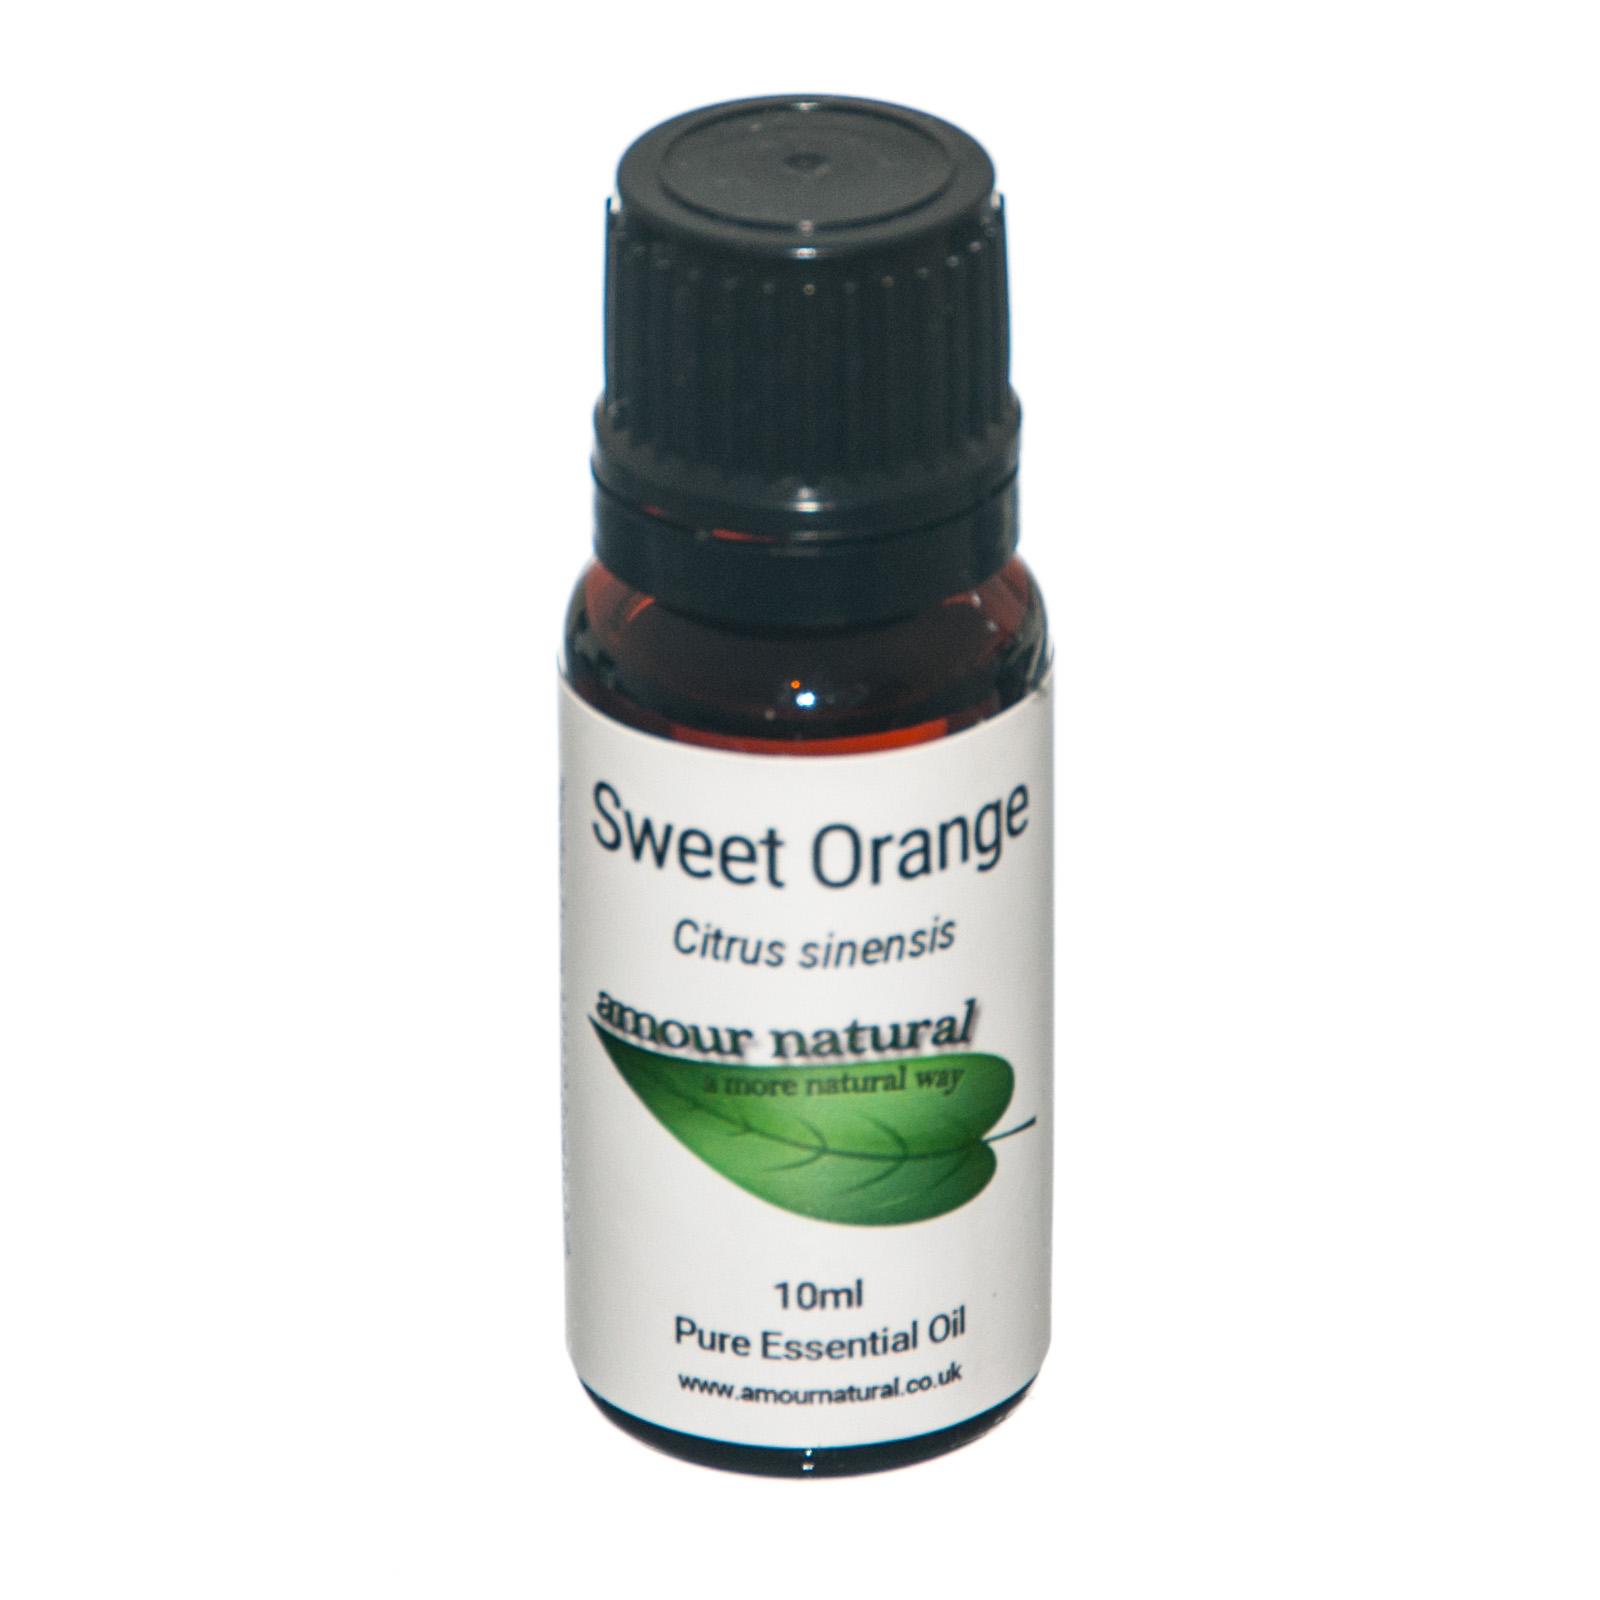 Sweet Orange 10ml